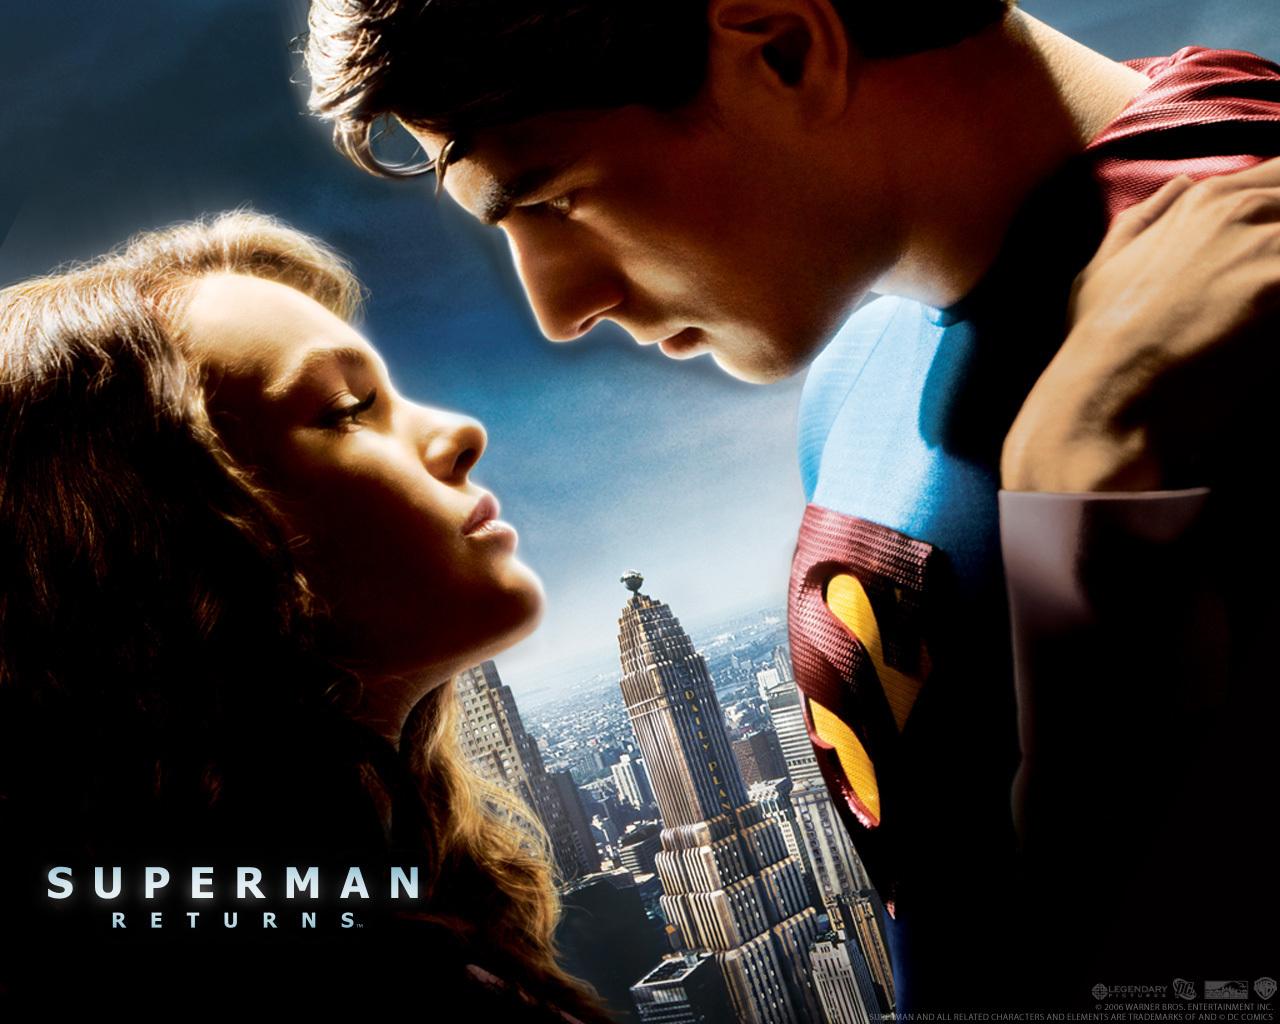 Superman Returns wallpaper - Superman Returns Wallpaper ...